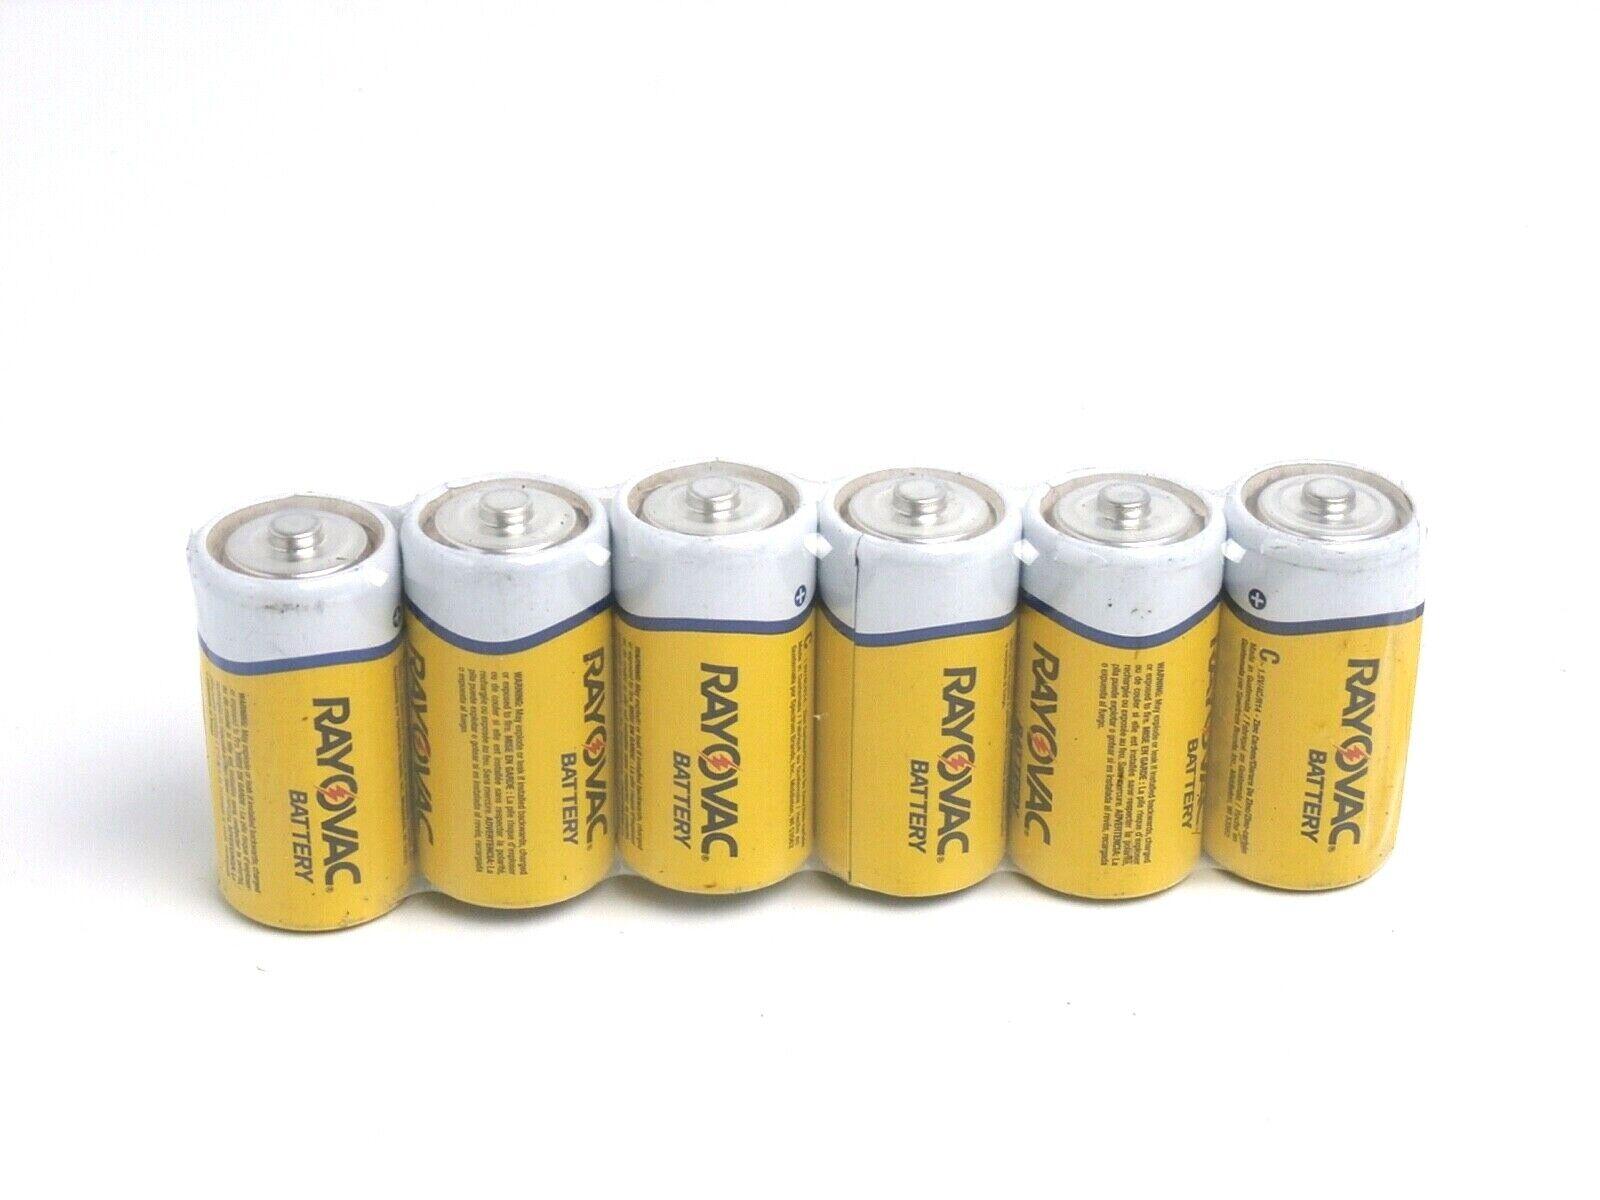 Rayovac Heavy Duty Batteries, Size C,  HD-CD, 6-Pack